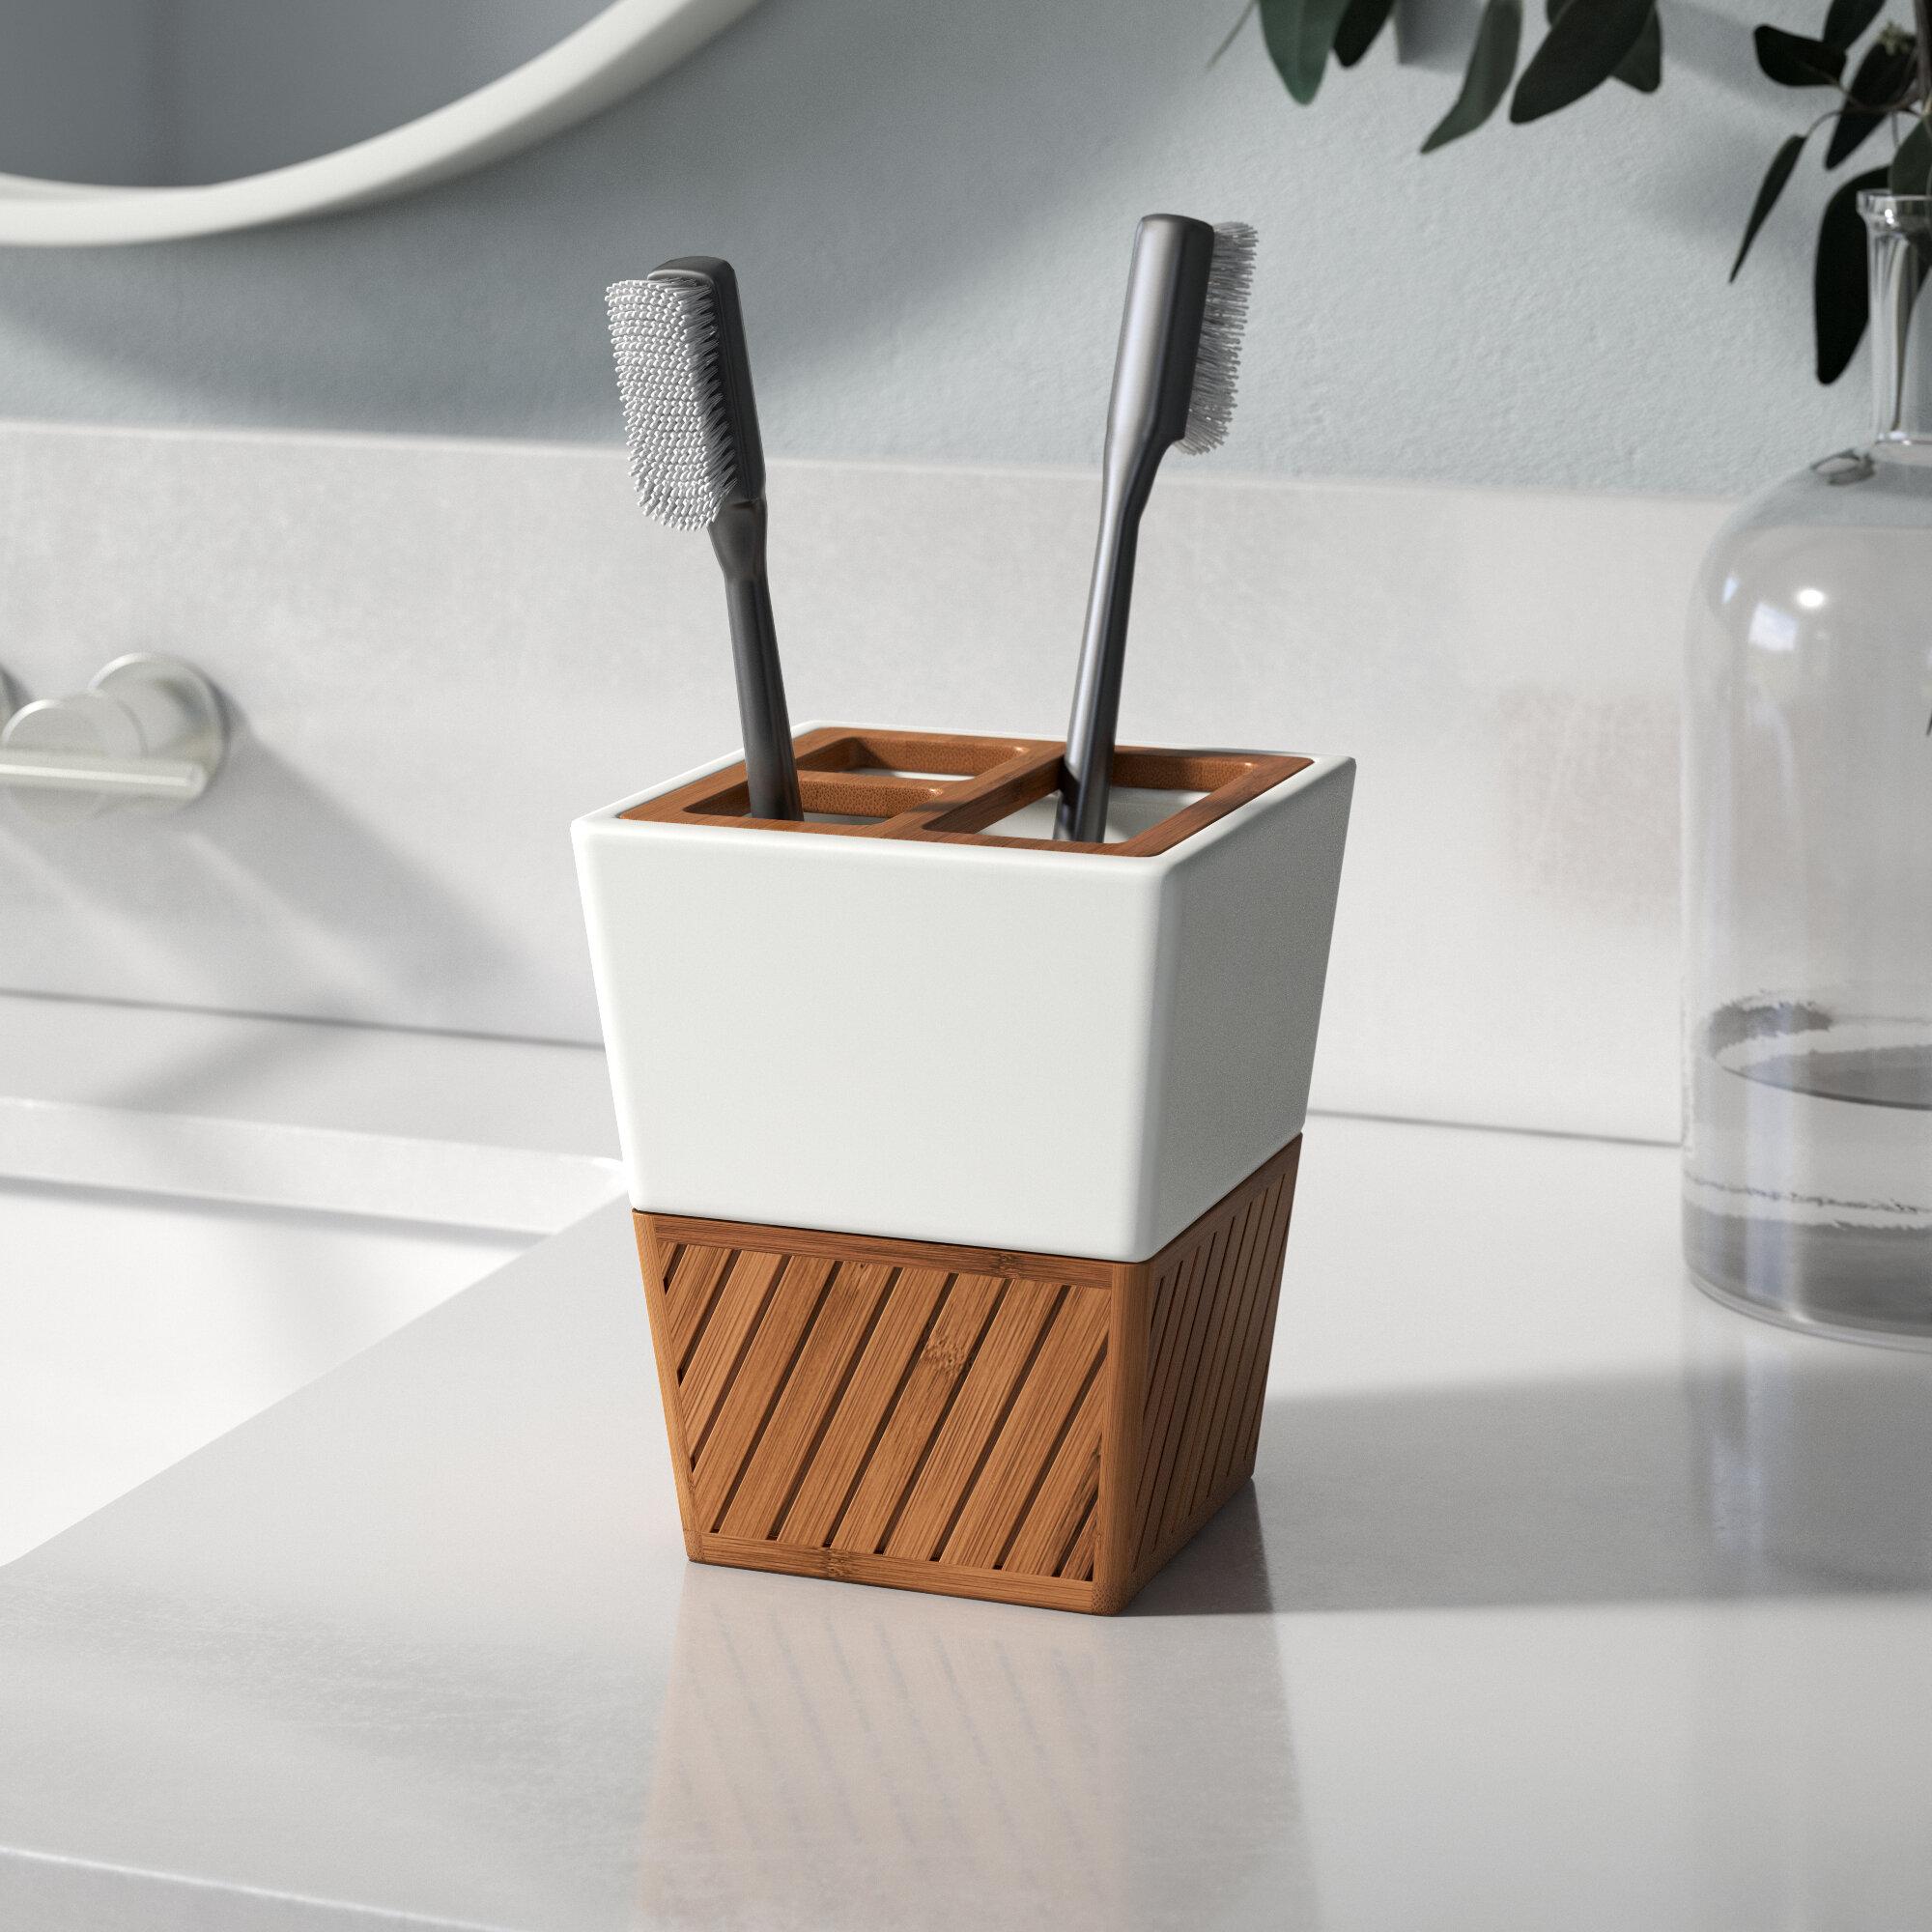 Brown Plastic Countertop Bath Accessories You Ll Love In 2021 Wayfair